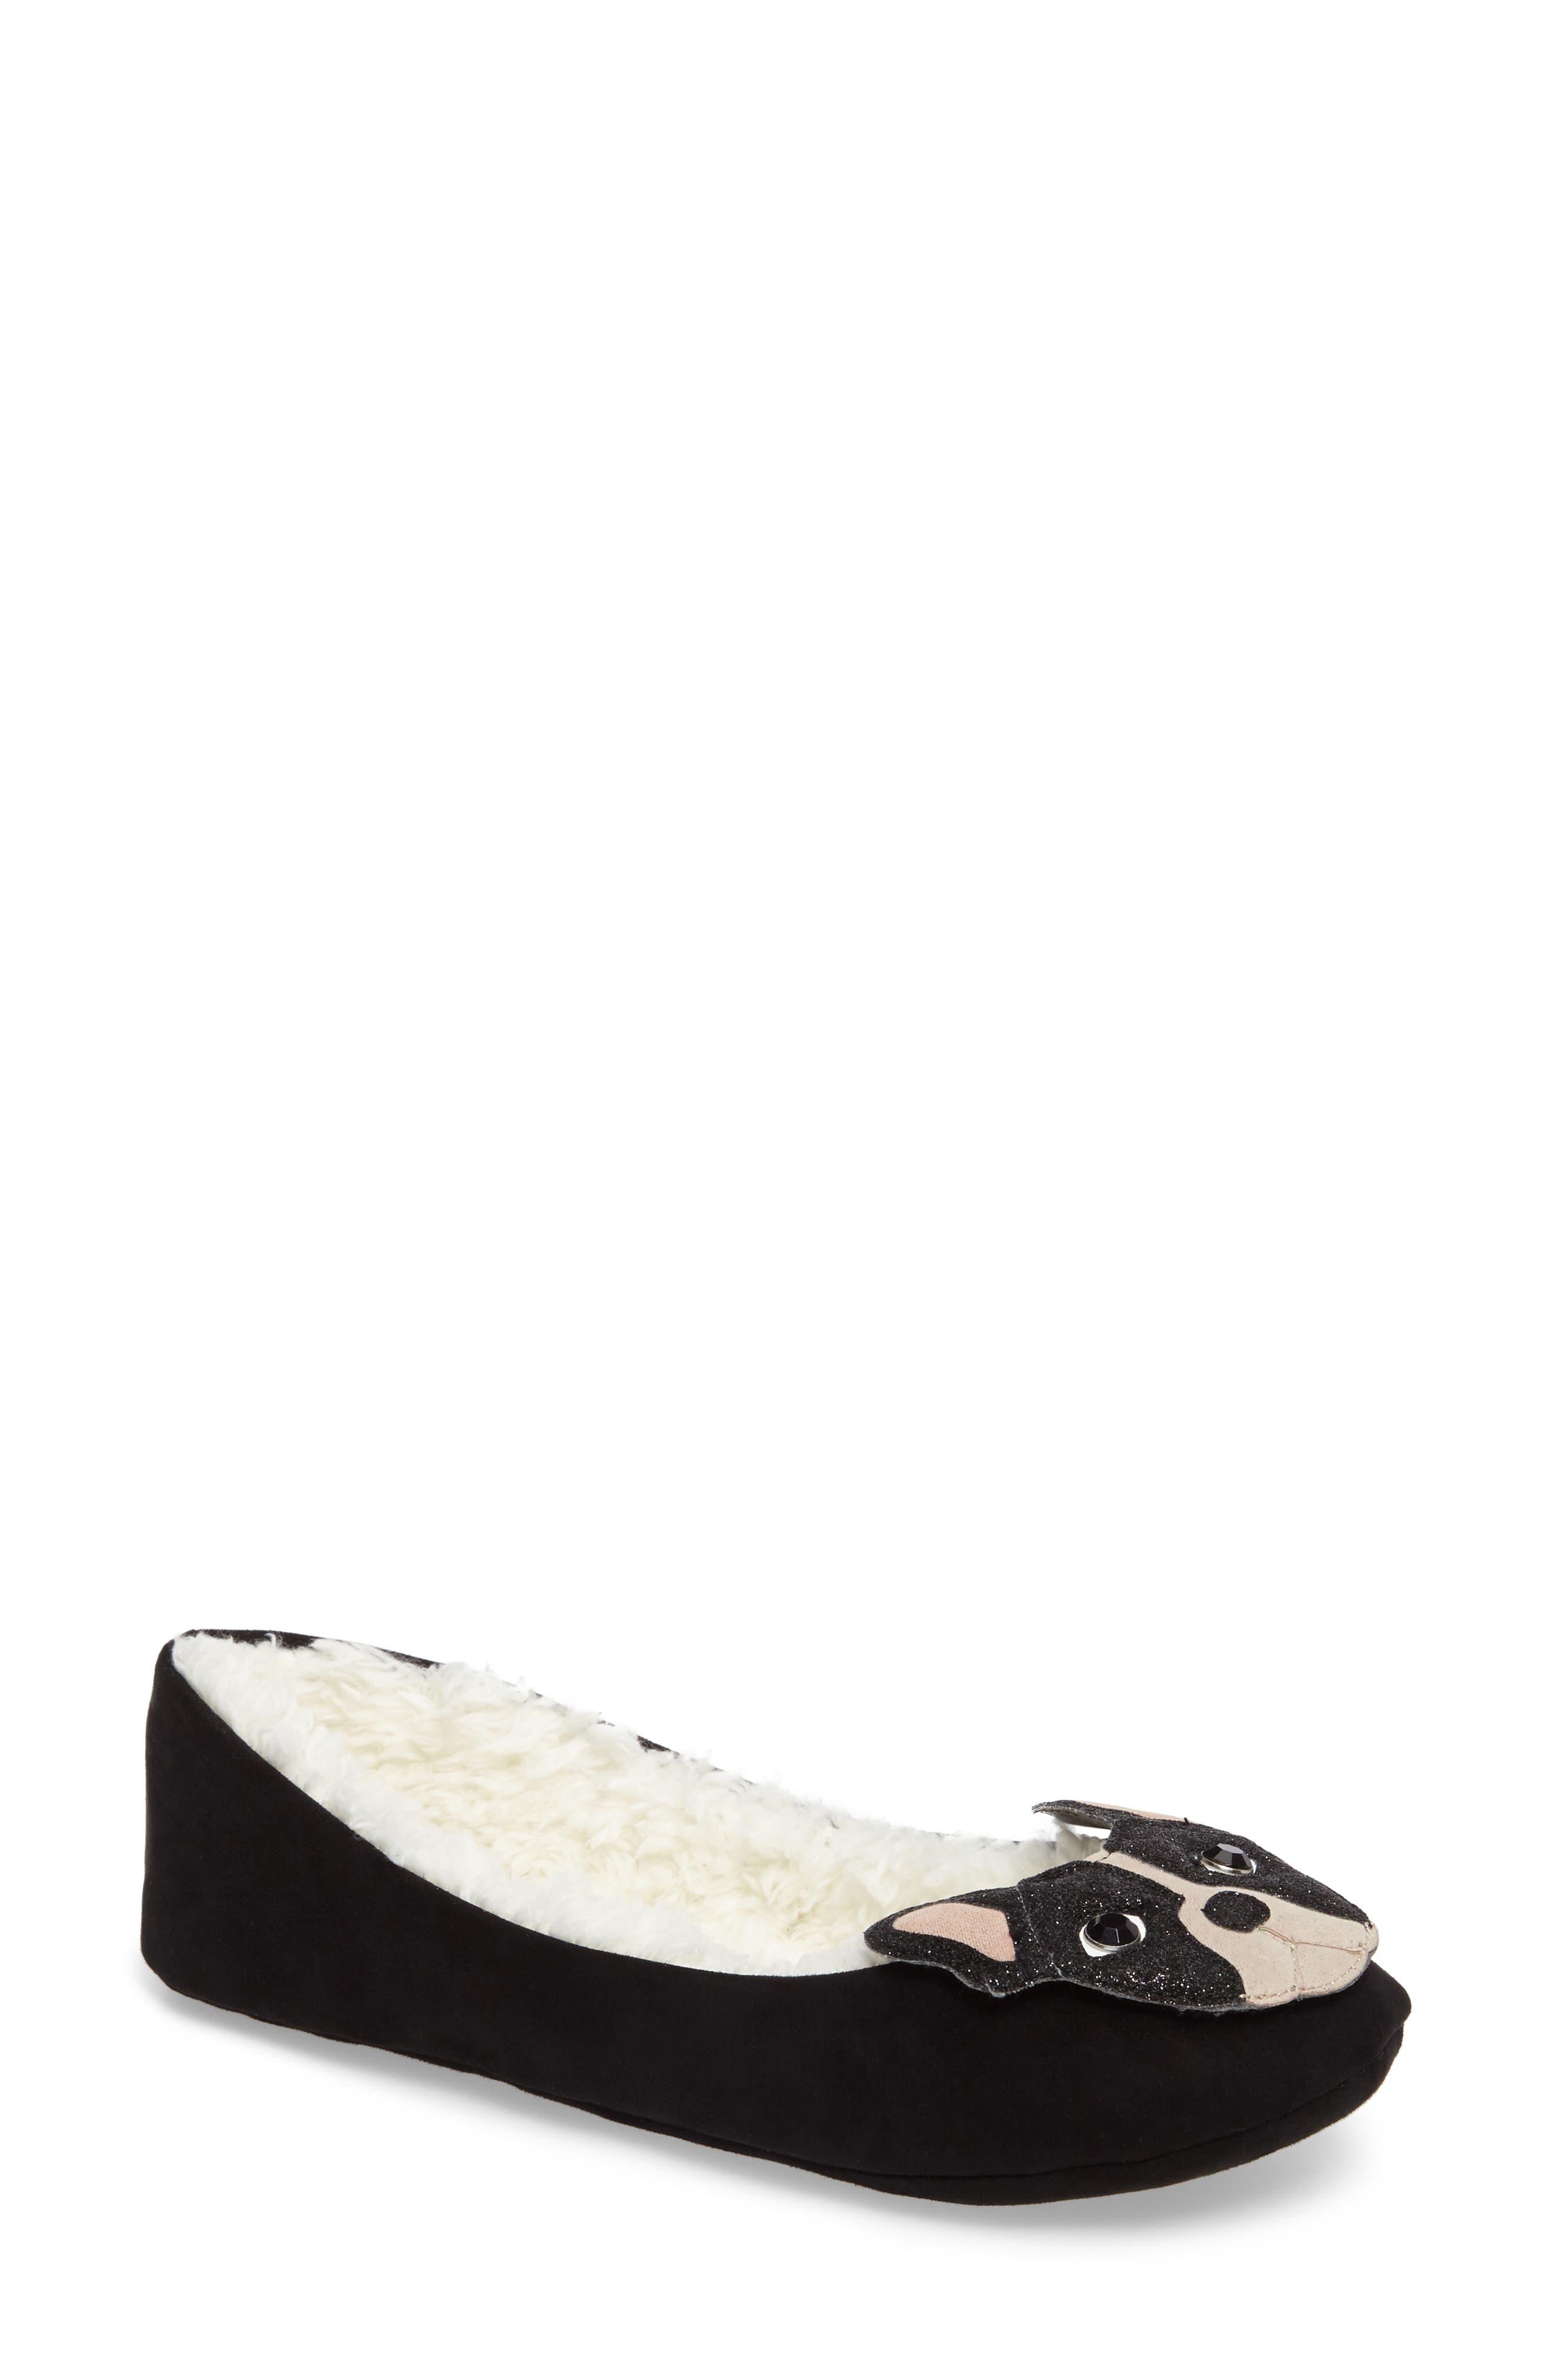 Main Image - kate spade new york seymour slipper (Women)